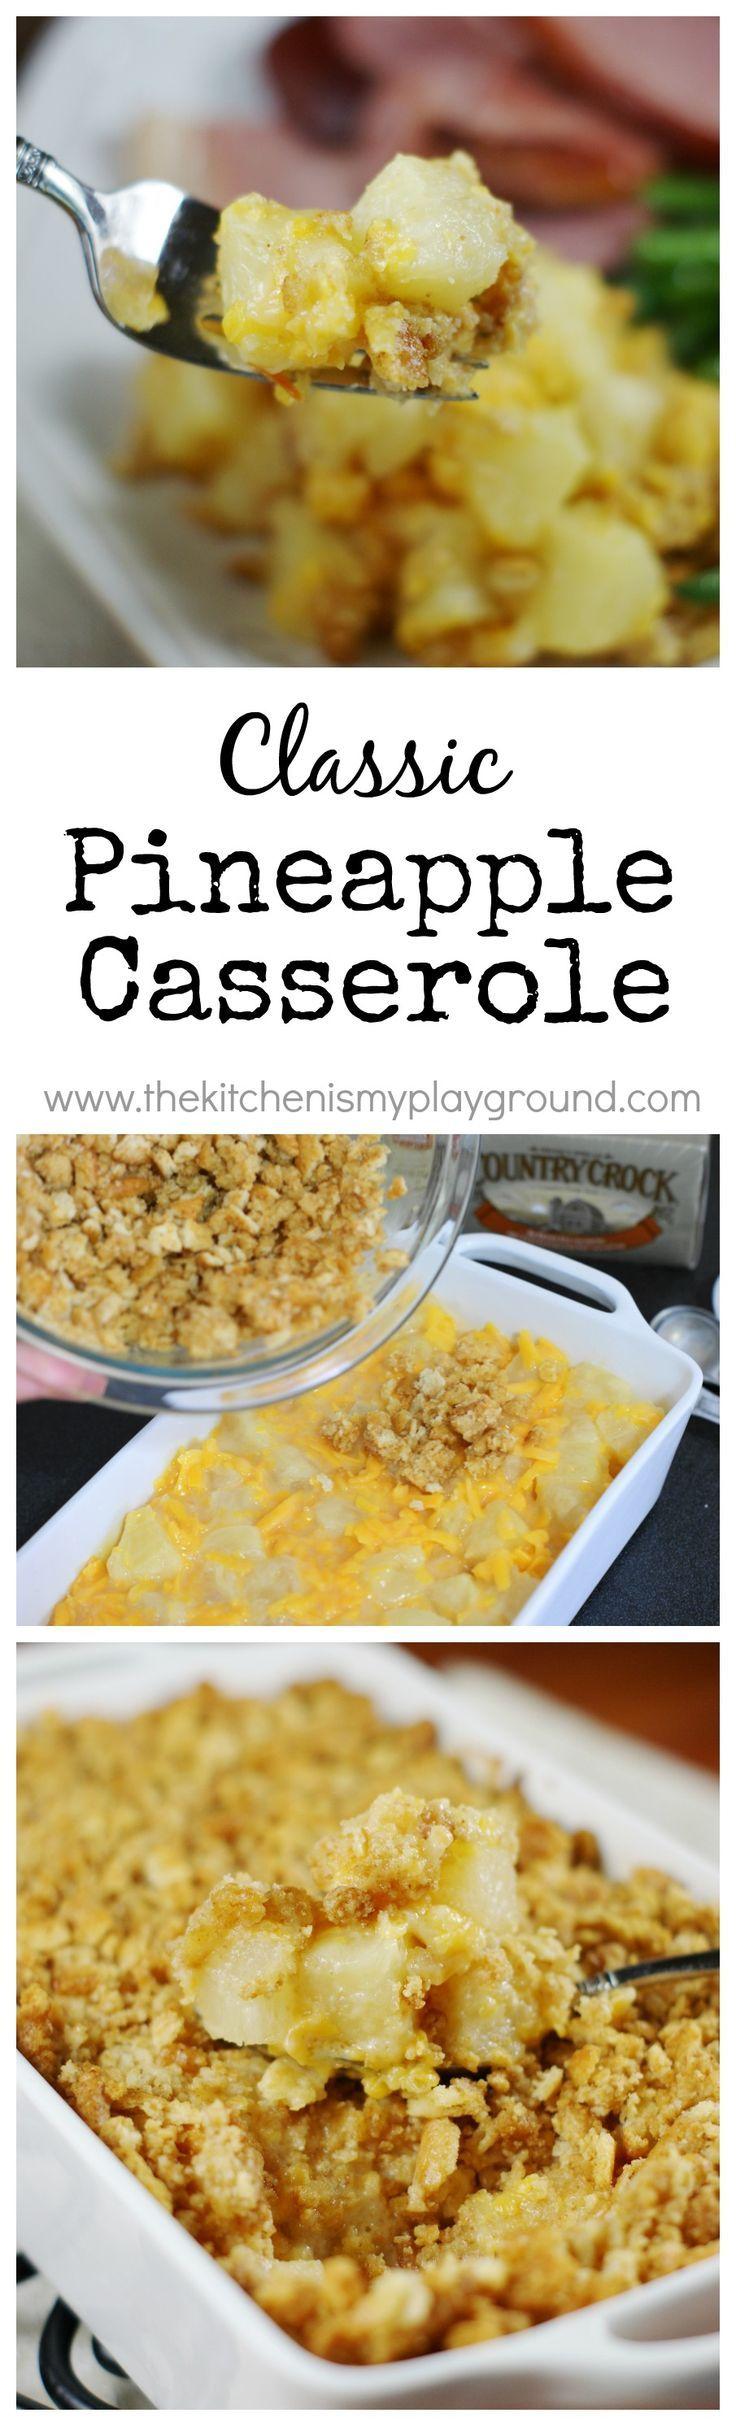 Classic Cheesy Pineapple Casserole ~ always a crowd favorite! www.thekitchenismyplayground.com #pineapplecasserole